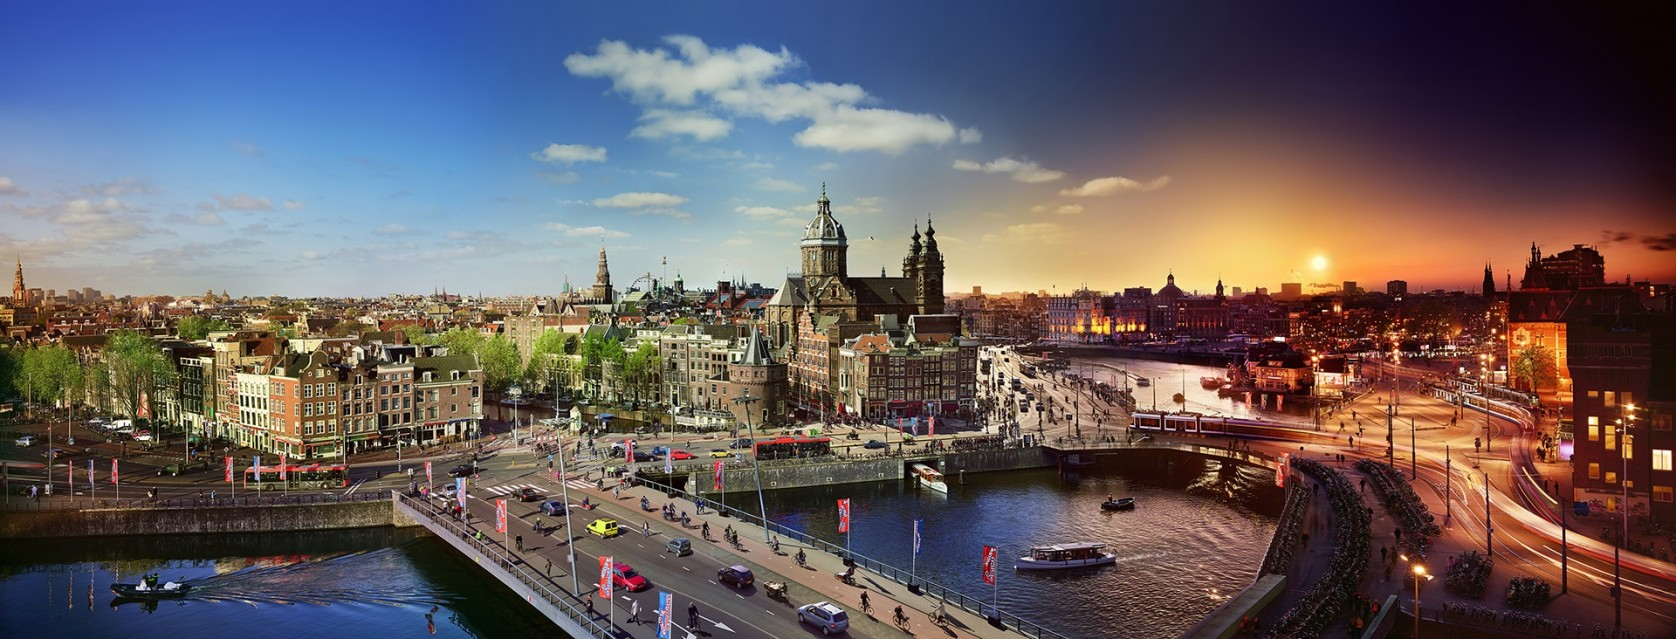 Amsterdam - Stephen WILKES